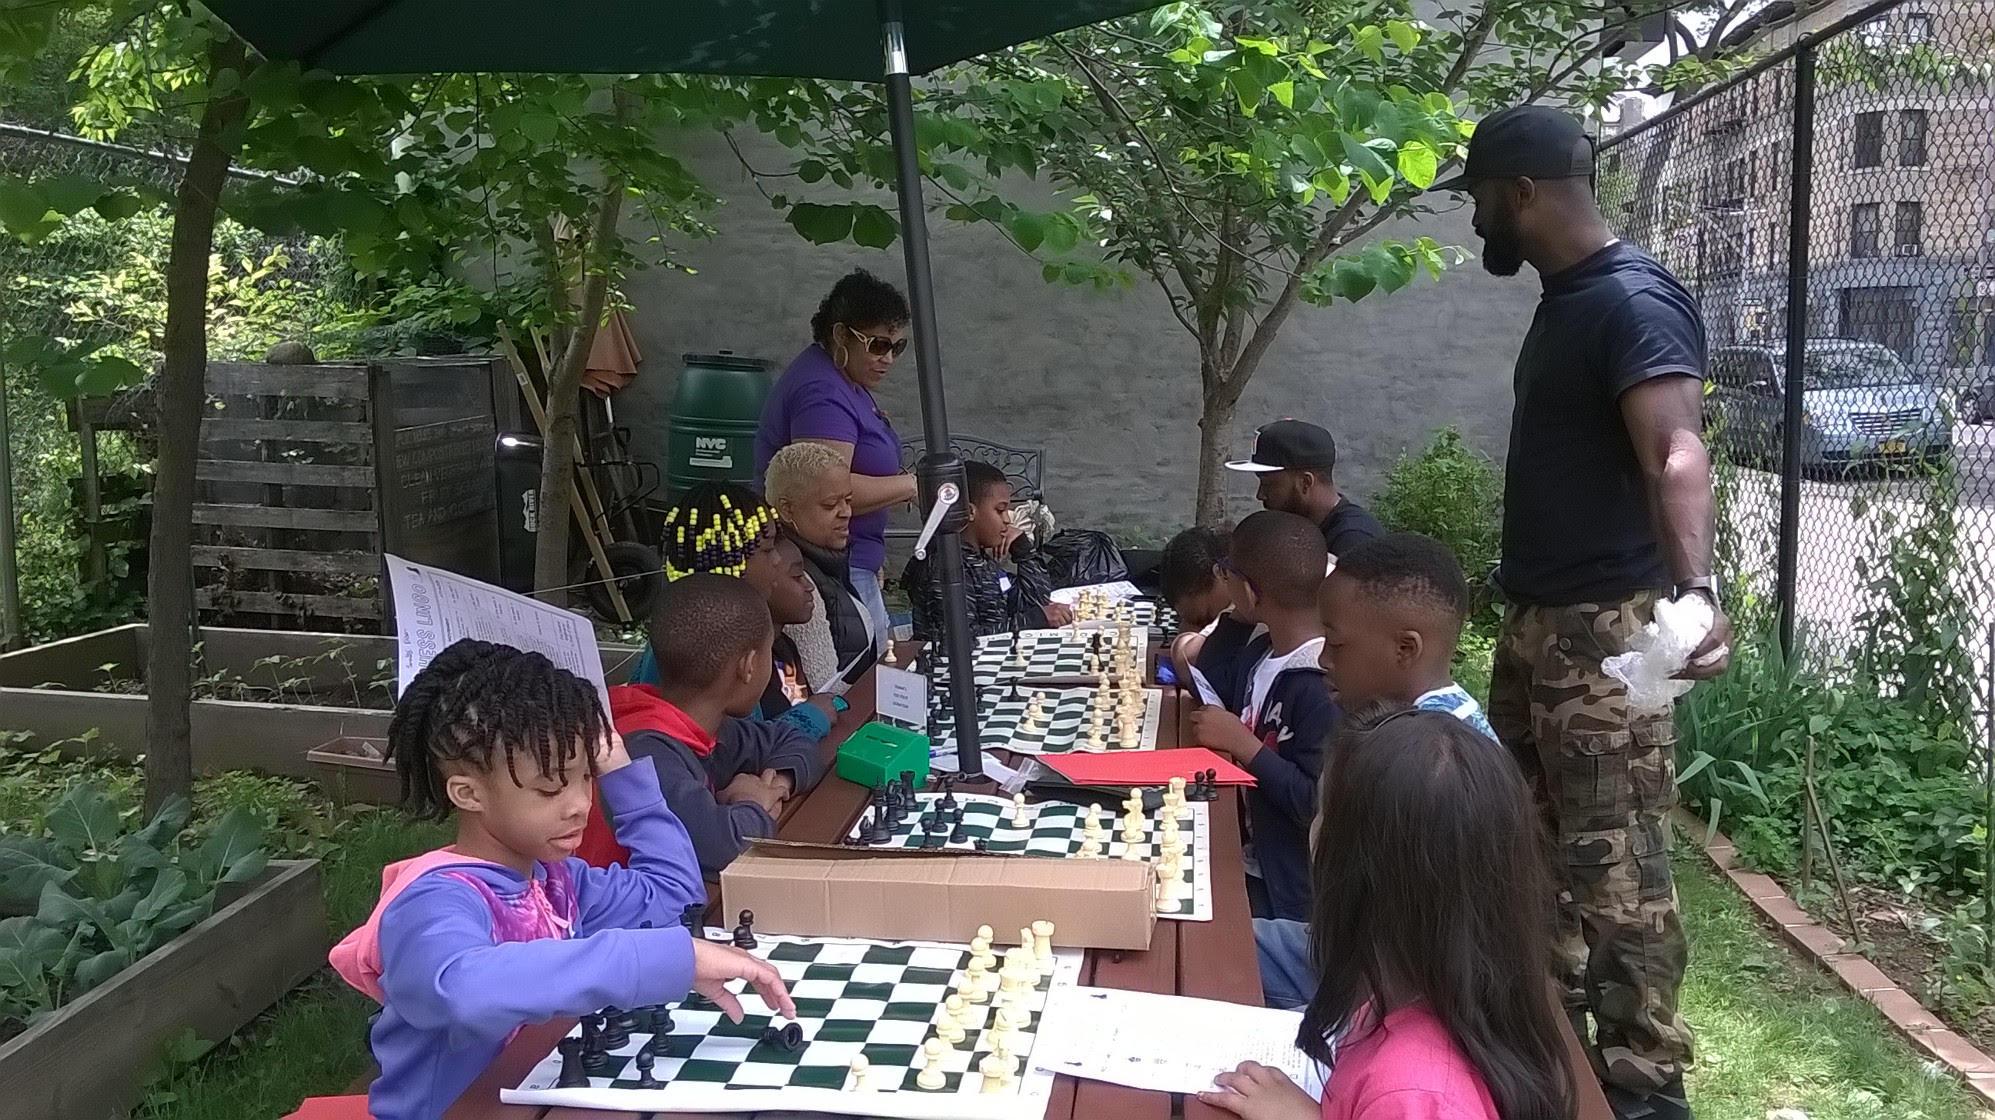 Chess in the Garden